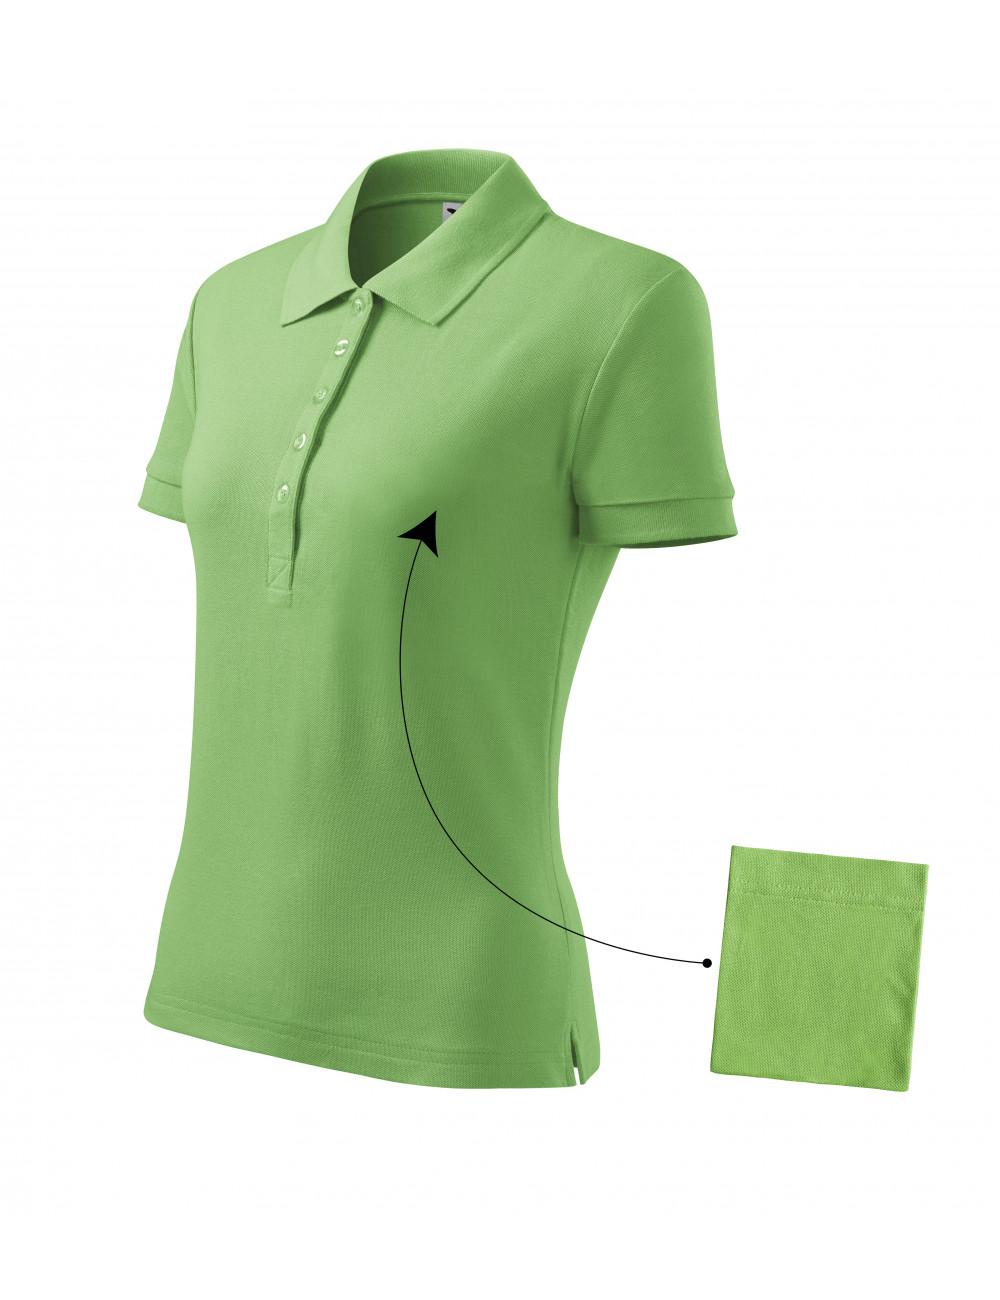 Adler MALFINI Koszulka polo damska Cotton 213 groszkowy